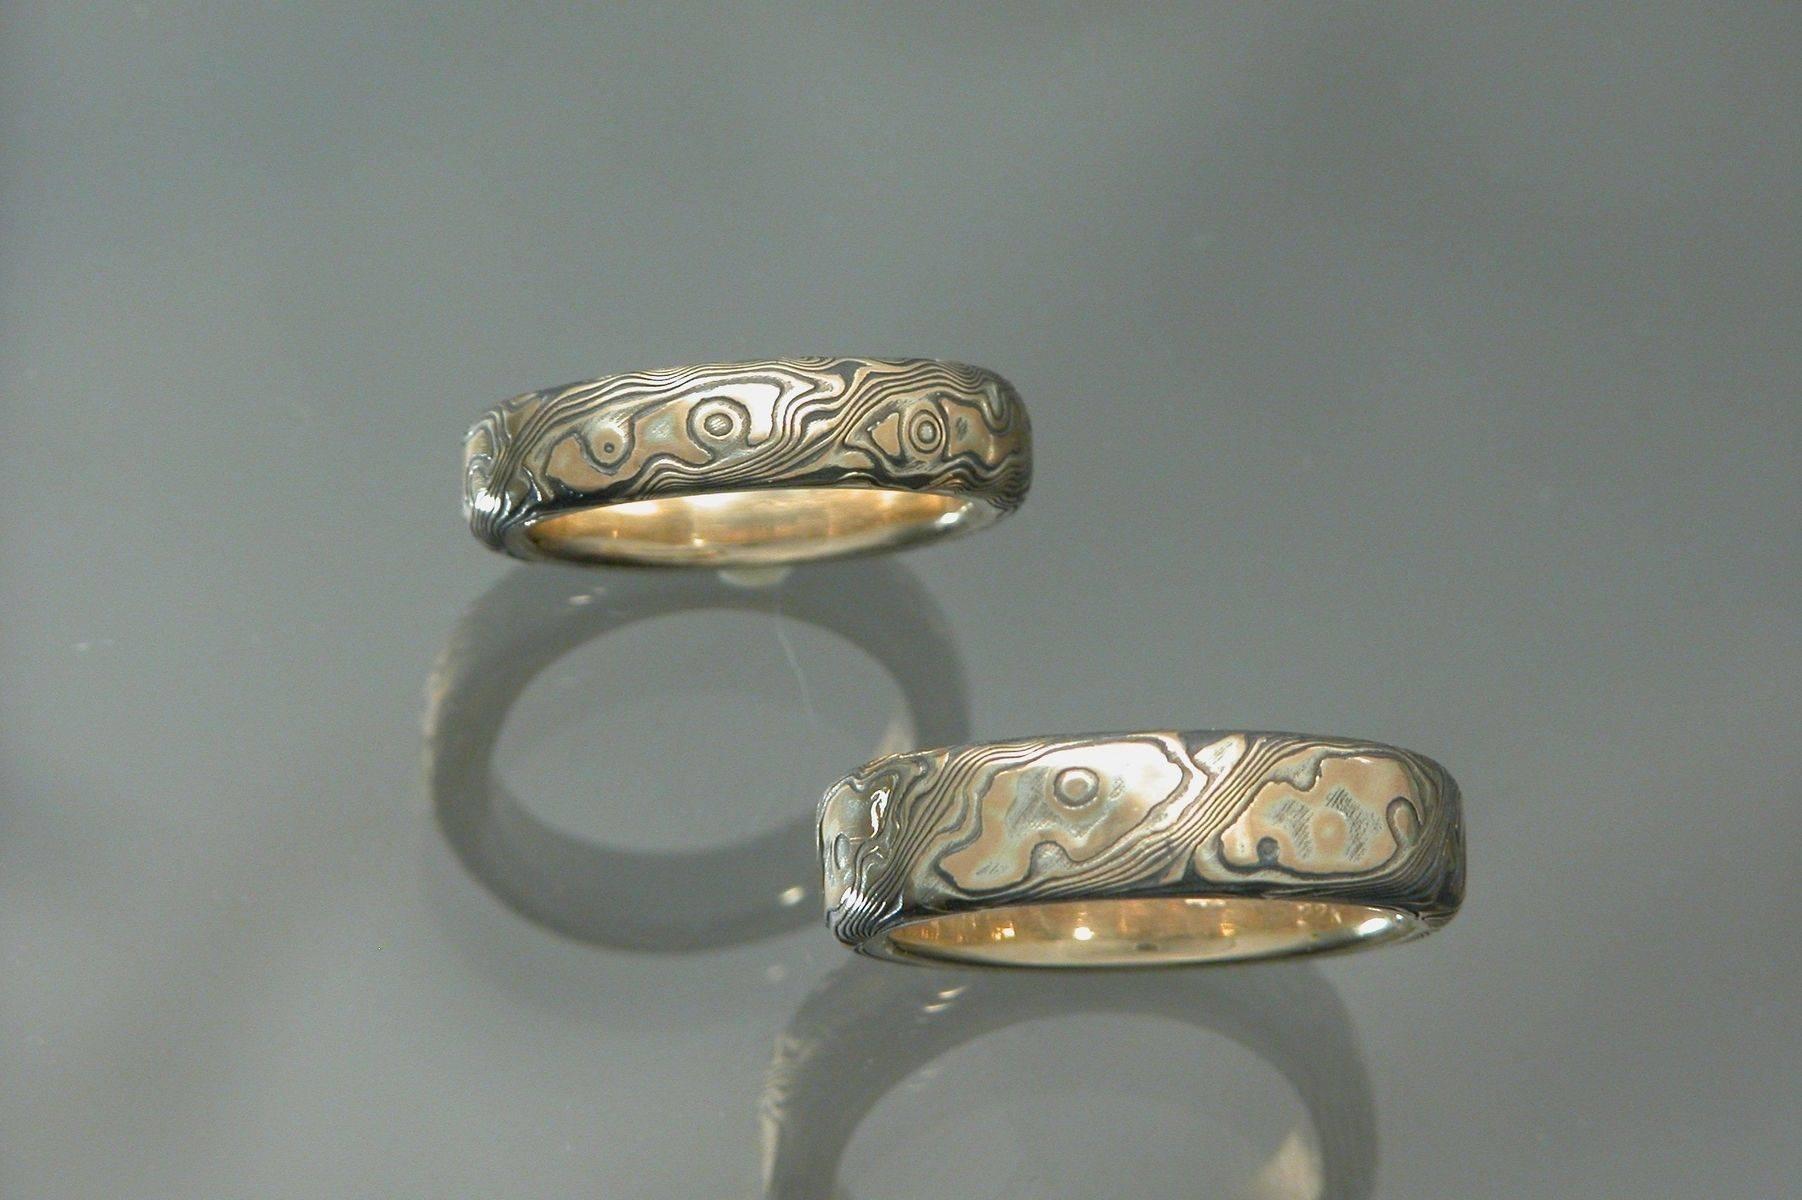 Mokume Gane Rings | Mokume Wedding Bands And Engagement Rings Intended For Mokume Wedding Bands (View 4 of 15)